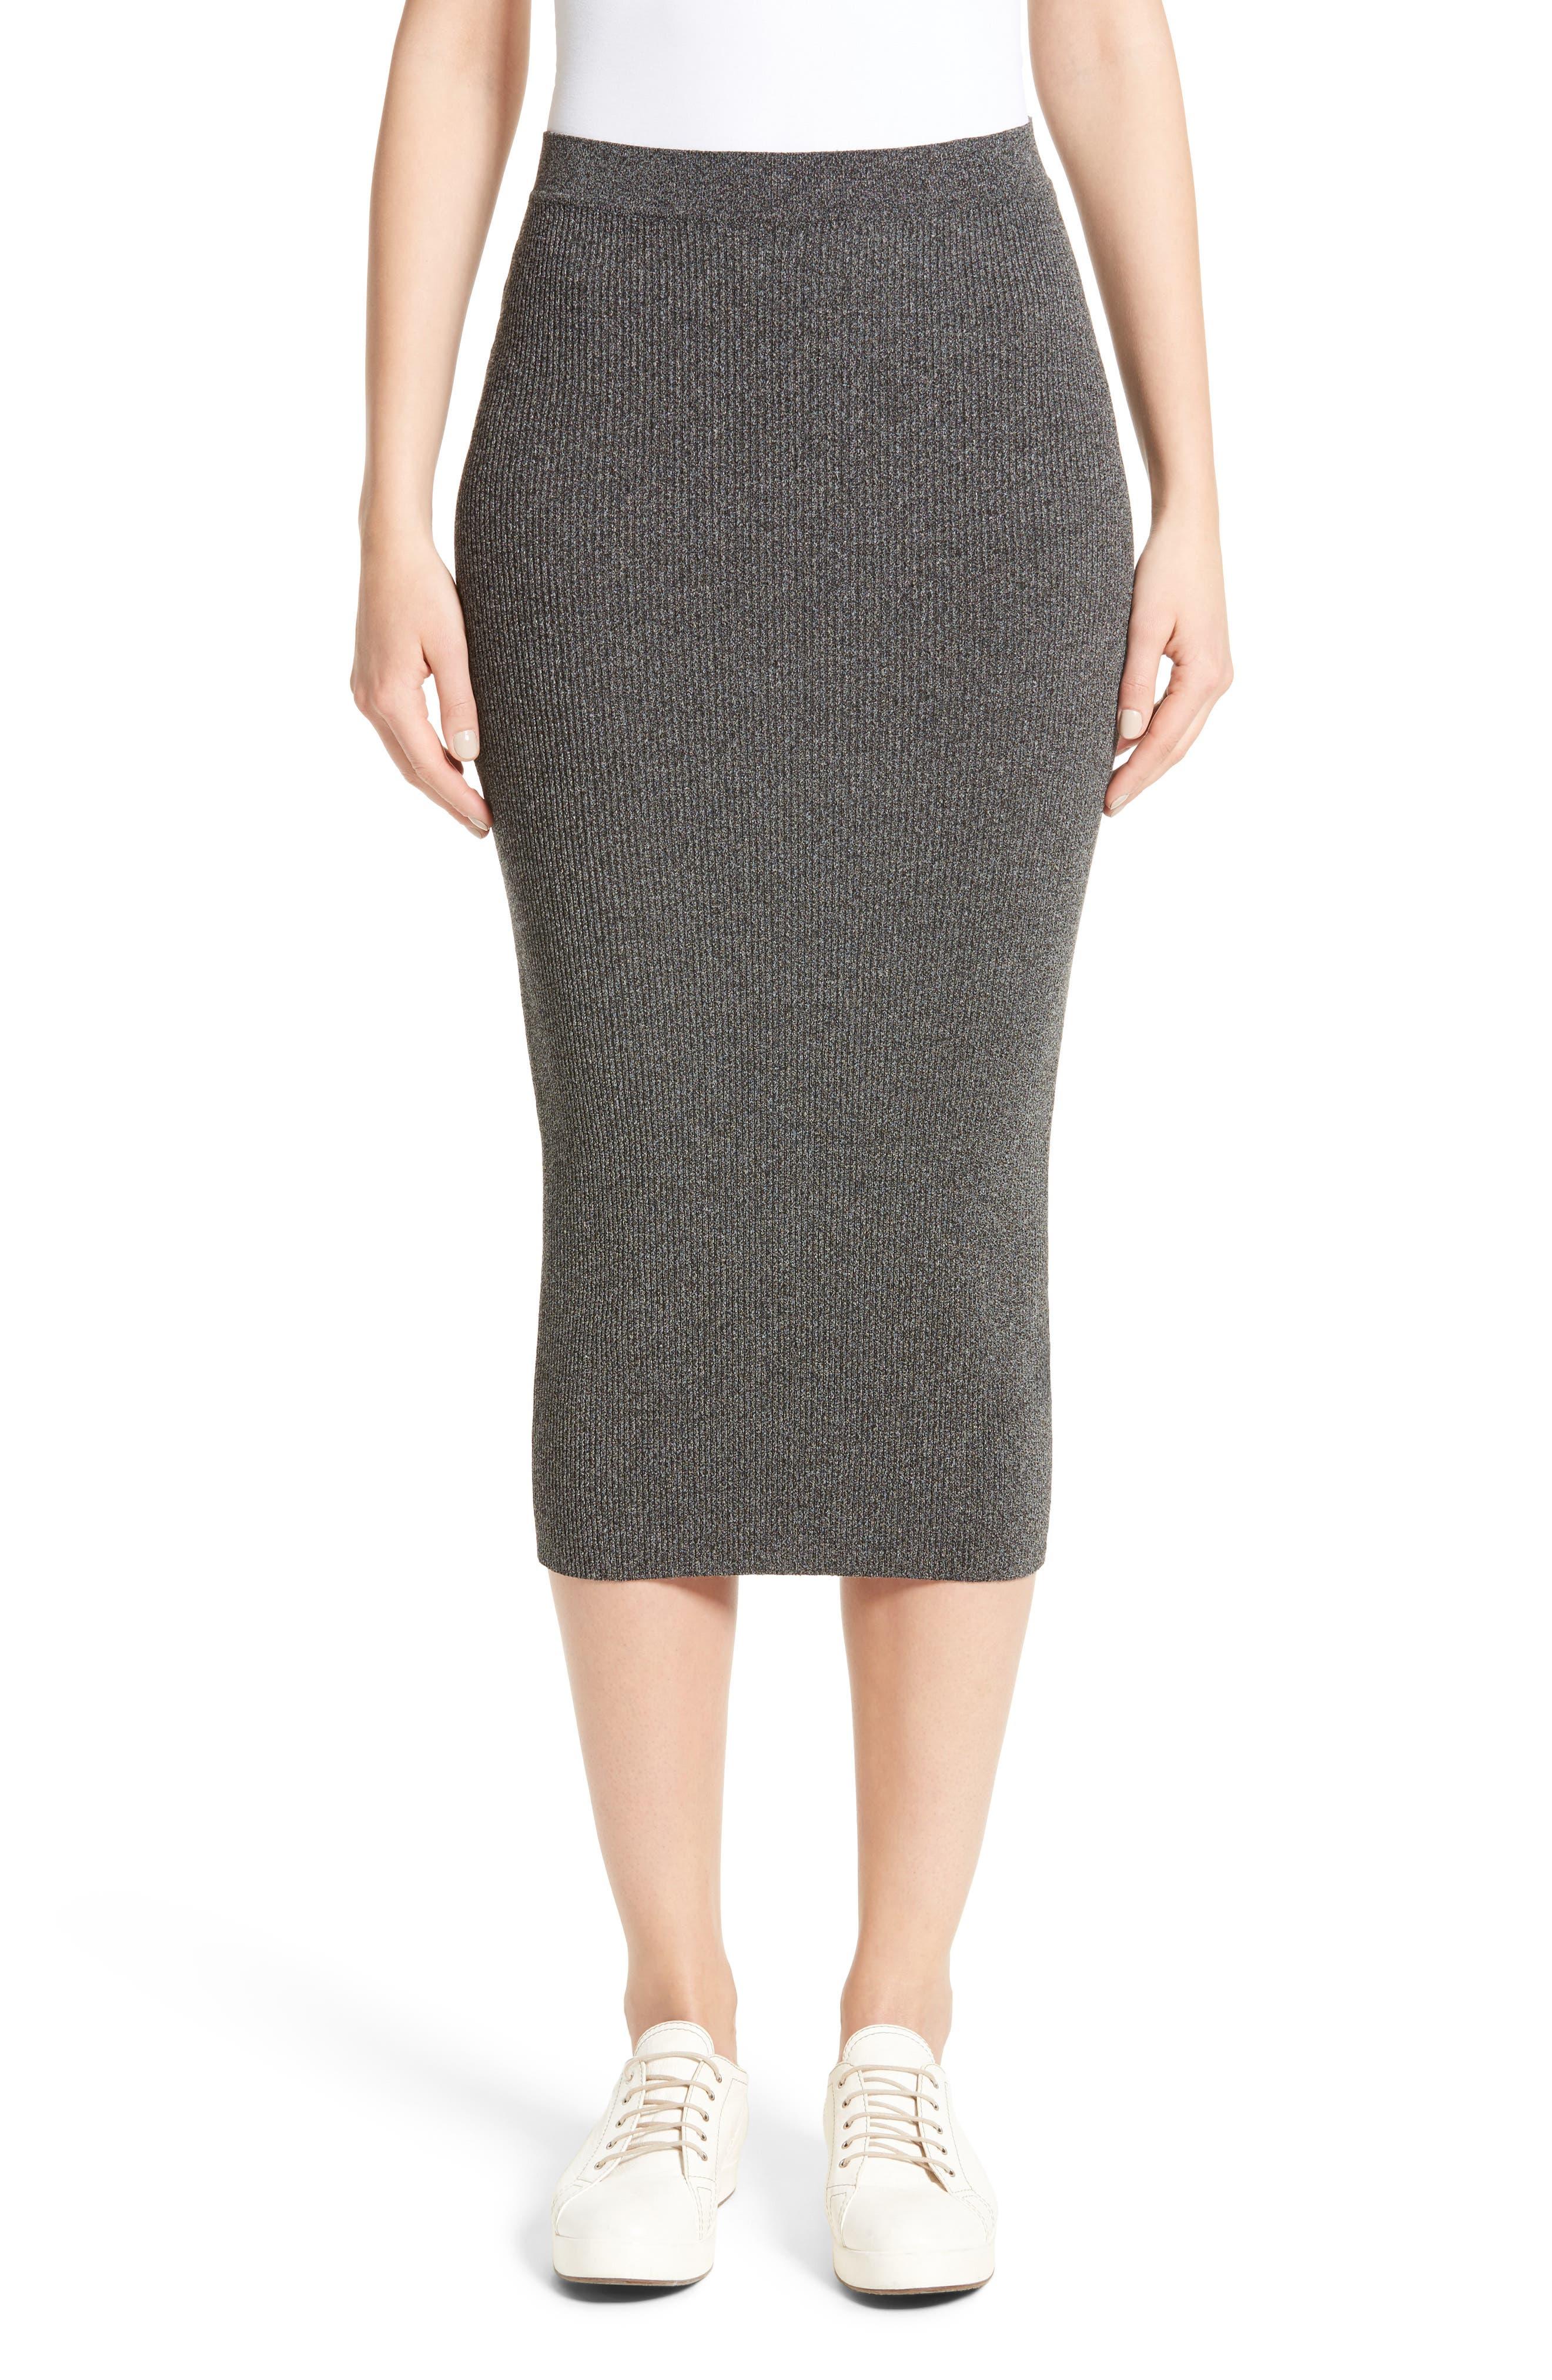 Alternate Image 1 Selected - Armani Jeans Rib Knit Midi Skirt